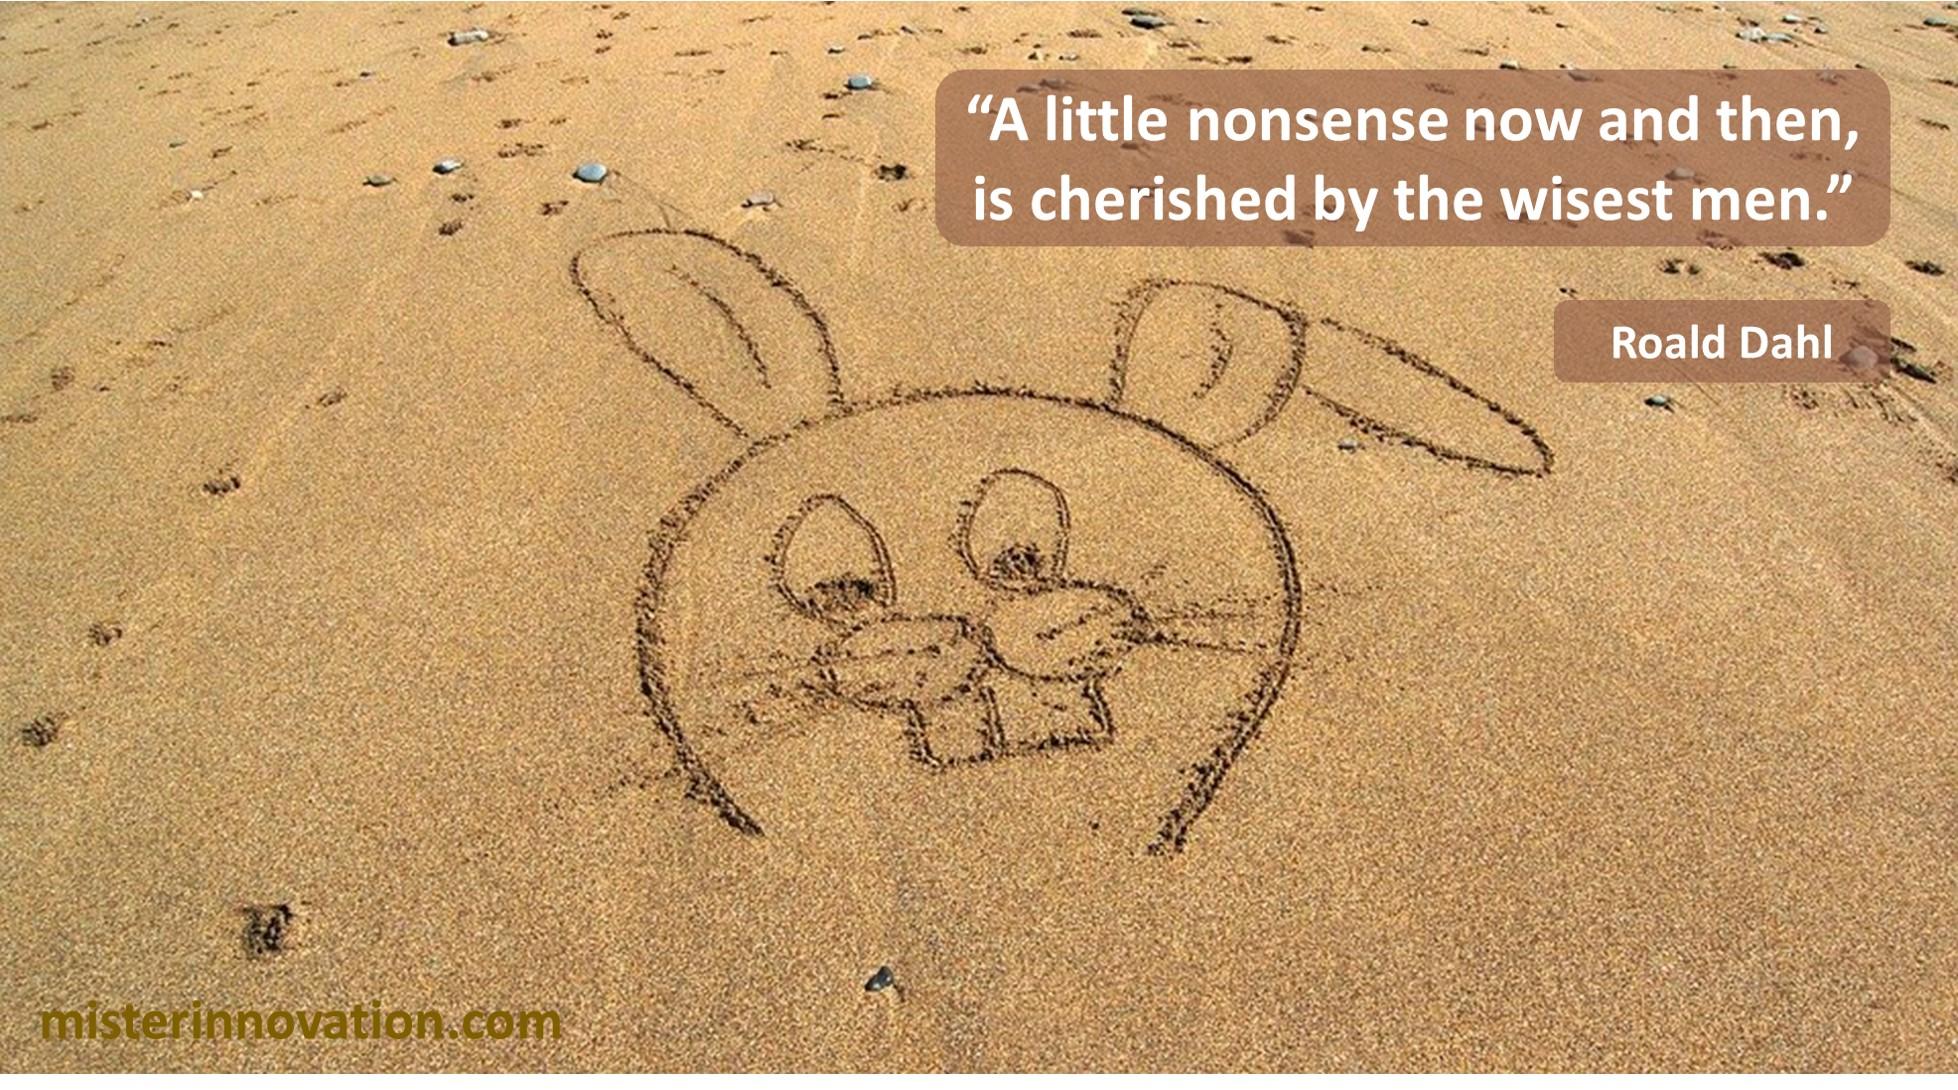 Roald Dahl Nonsense